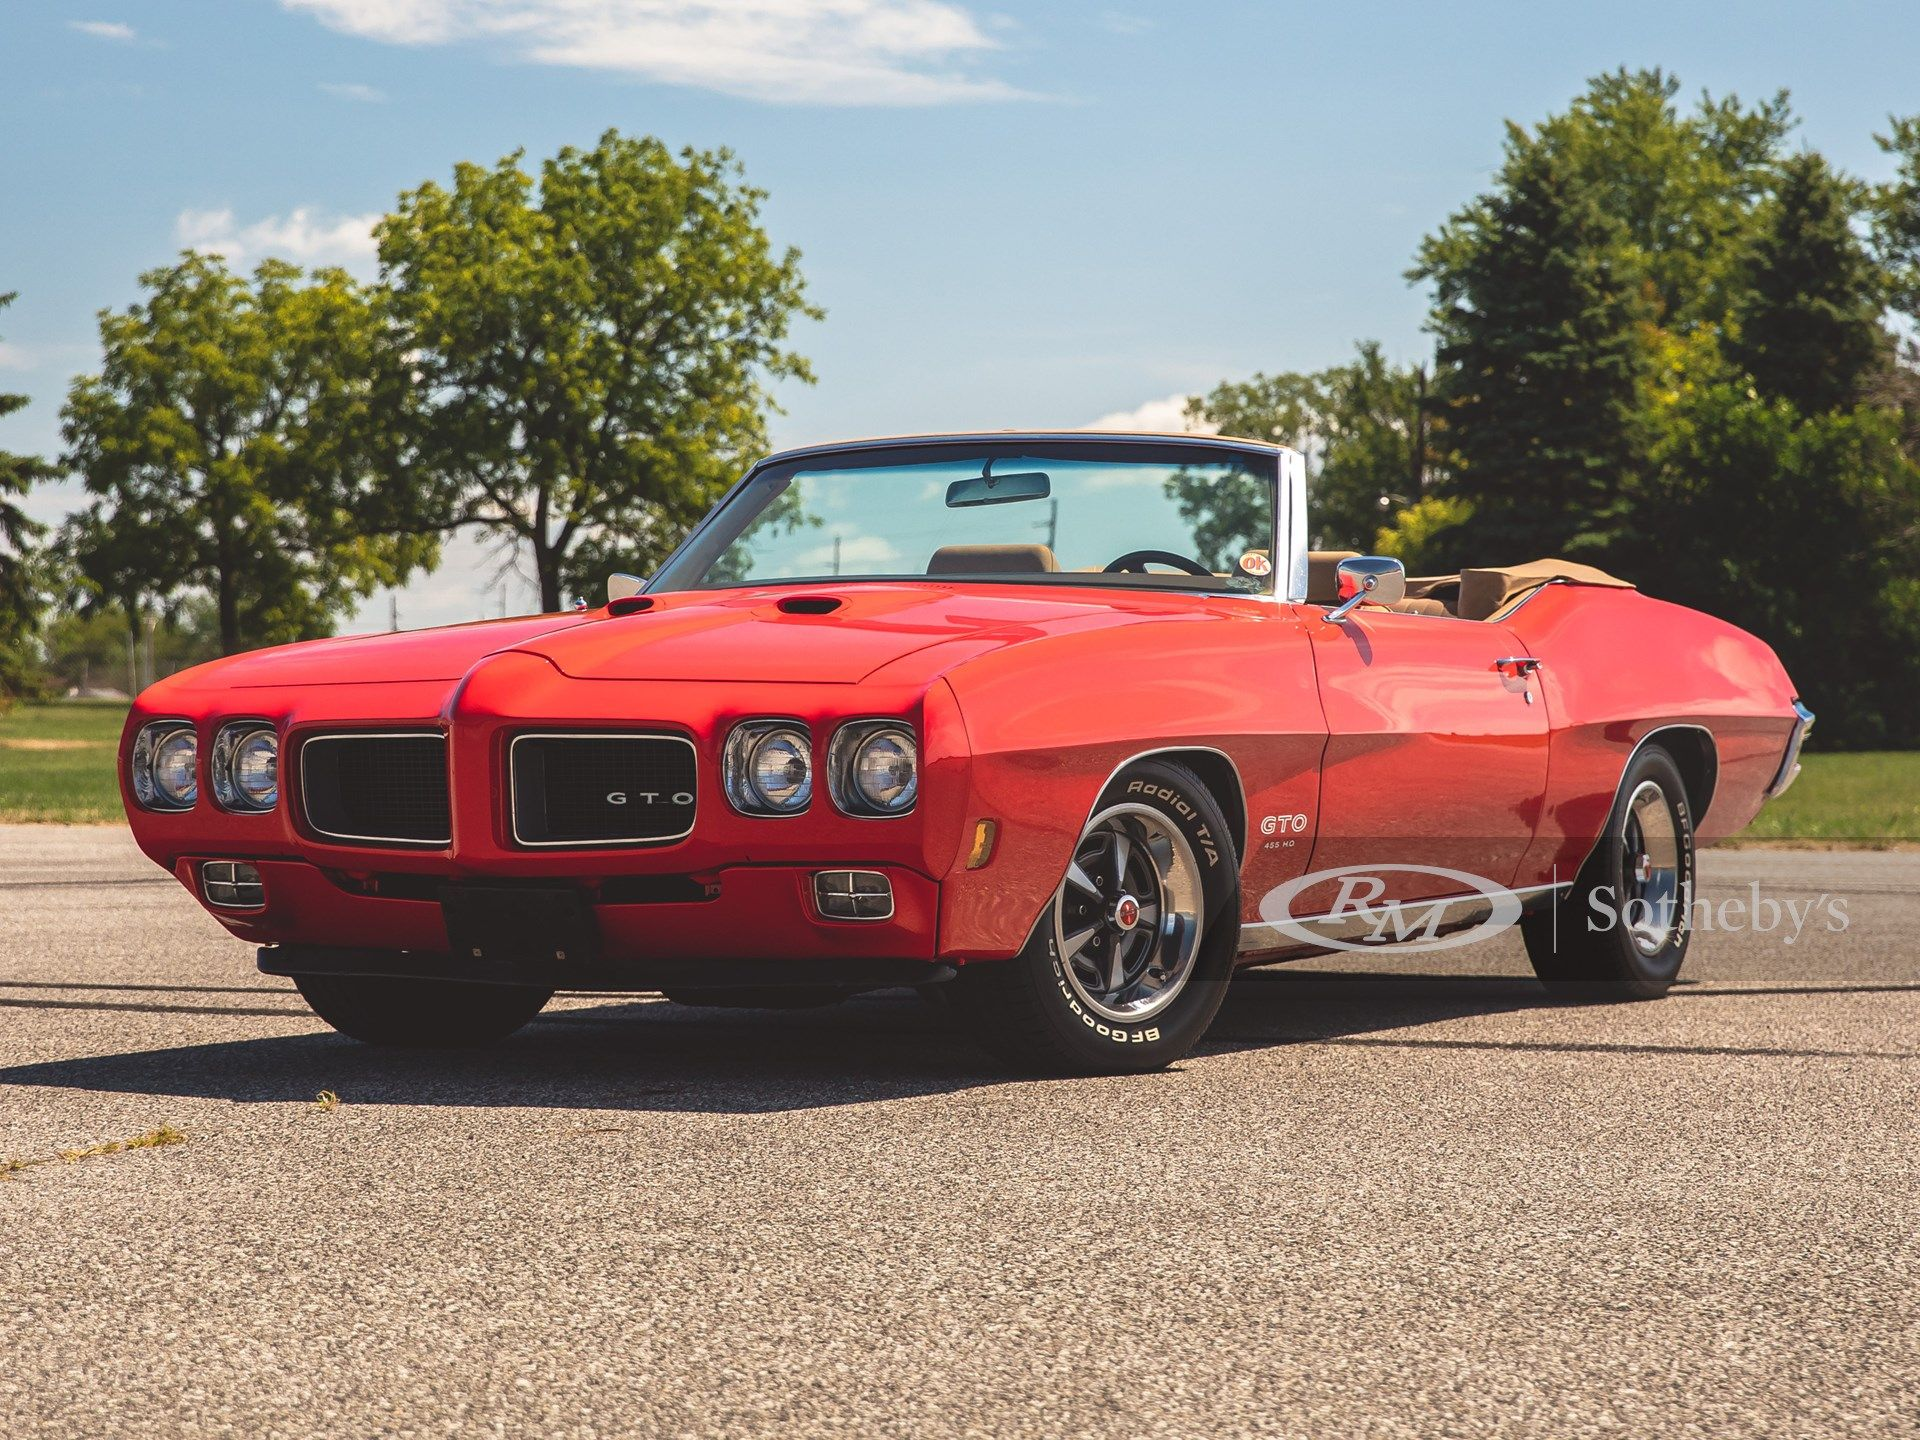 "<img src=""1970-pontiac-gto.jpg"" alt=""1970 Pontiac GTO Convertible up for grabs"">"